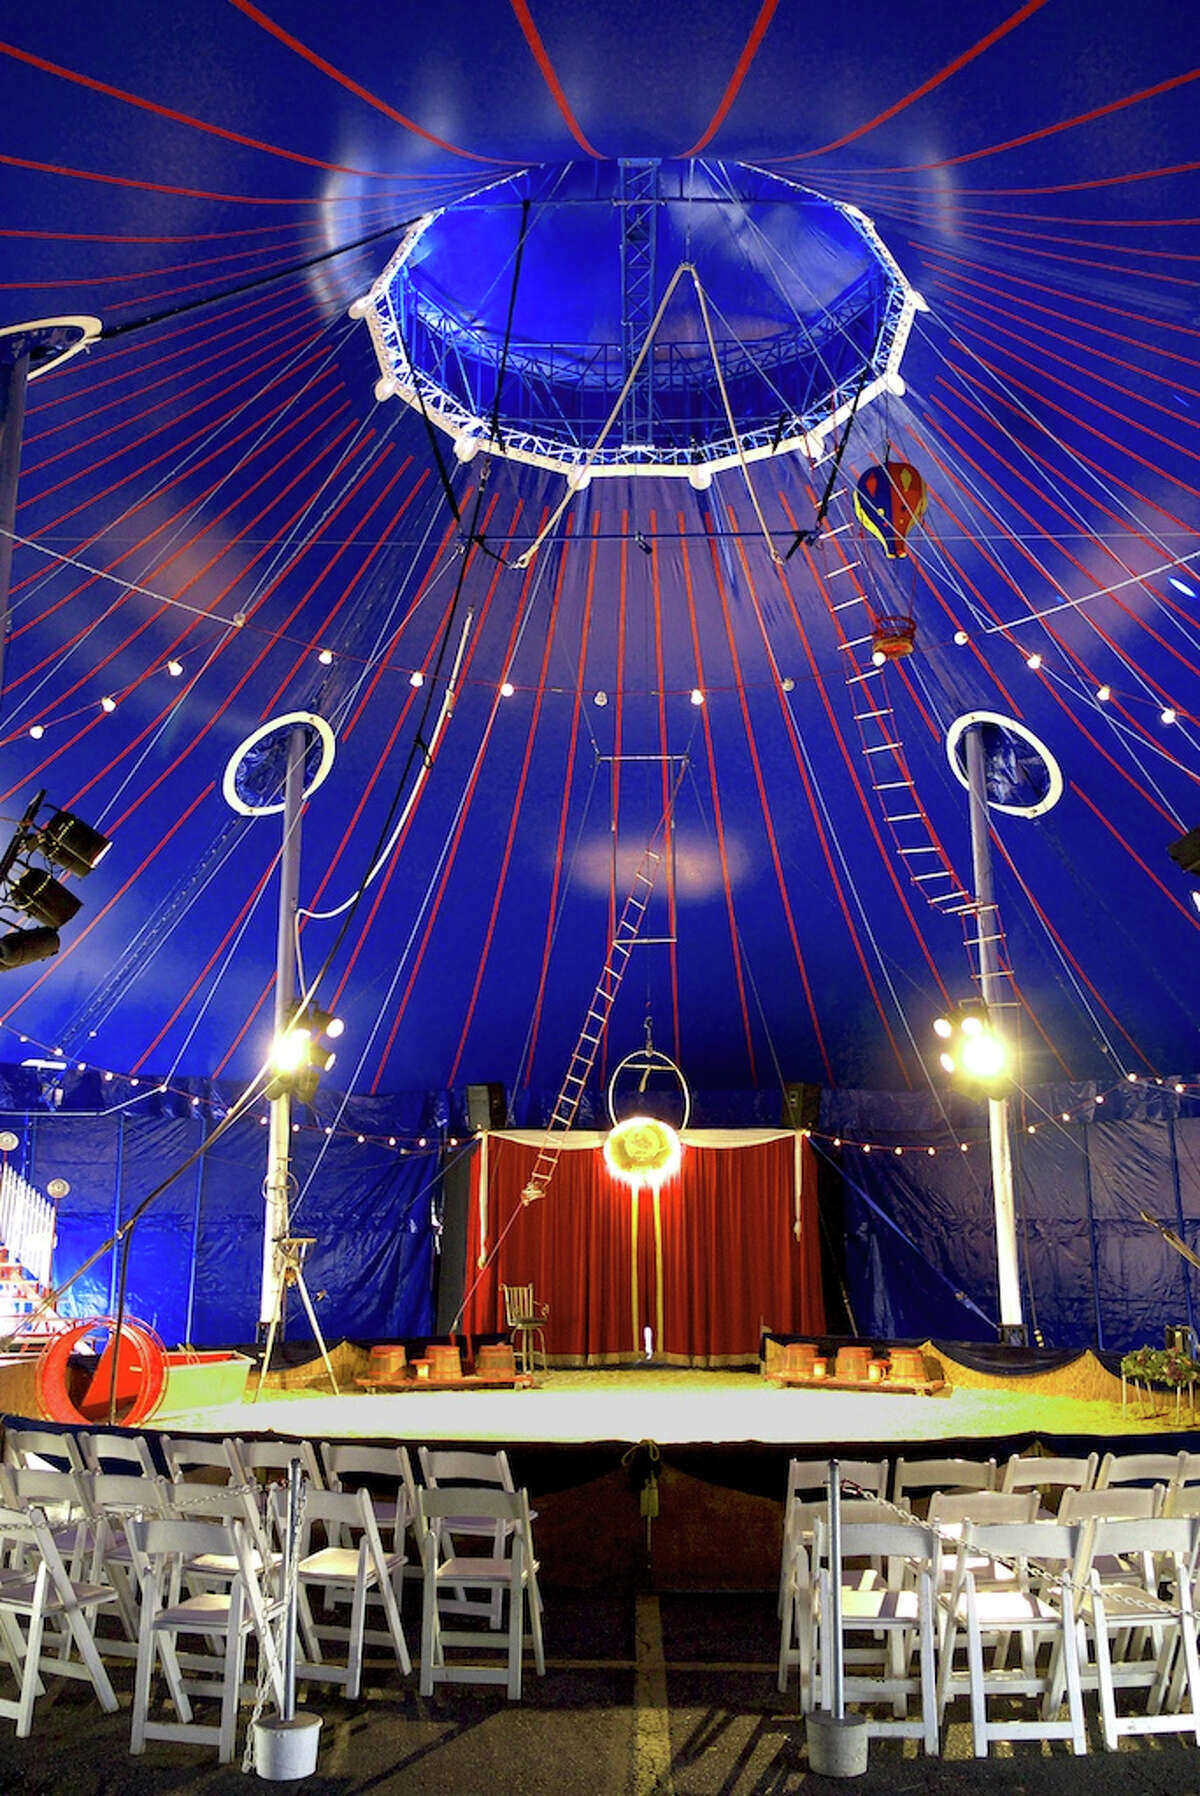 Zoppe Italian Circus (Rick Purdue)